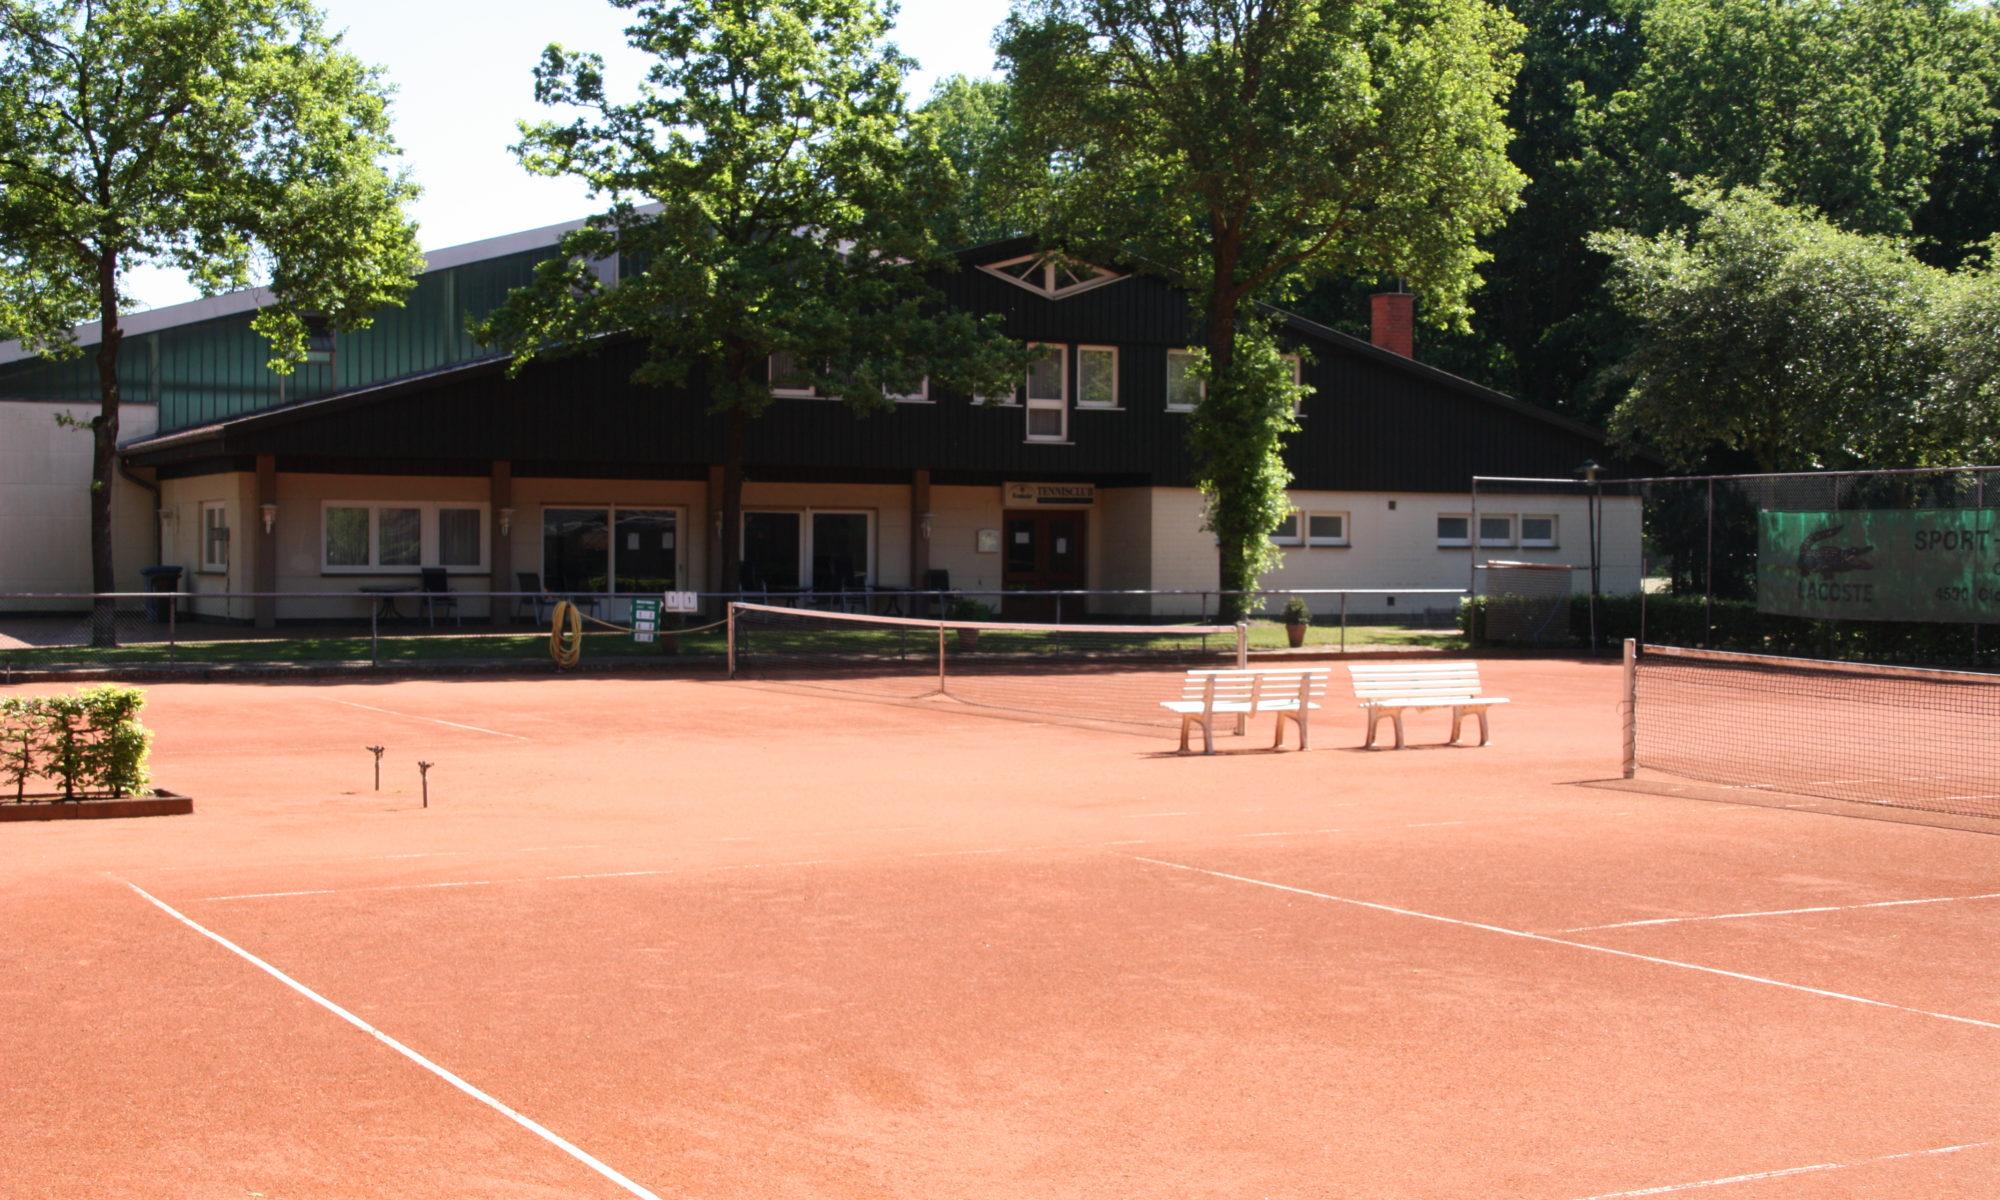 Anlage des Tennisclubs Nikolausdorf-Garrel